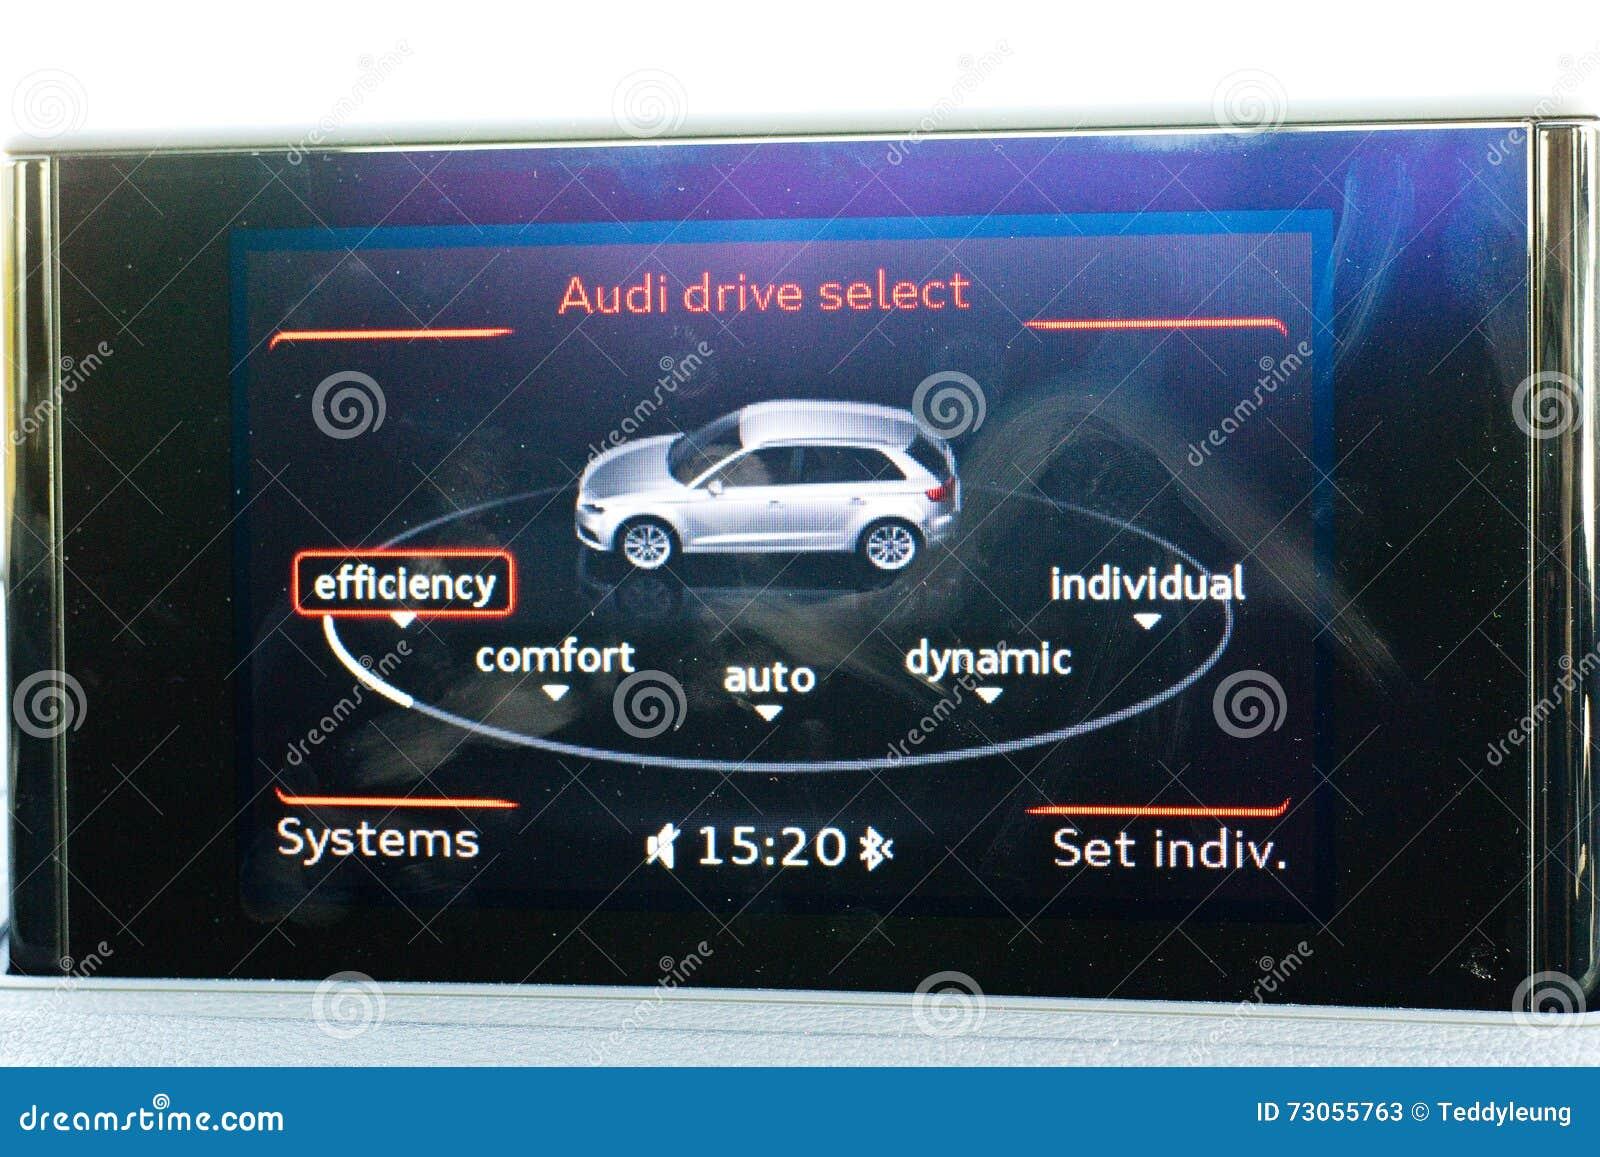 Audi Q3 2015 Dashboard Display Editorial Stock Photo Image Of